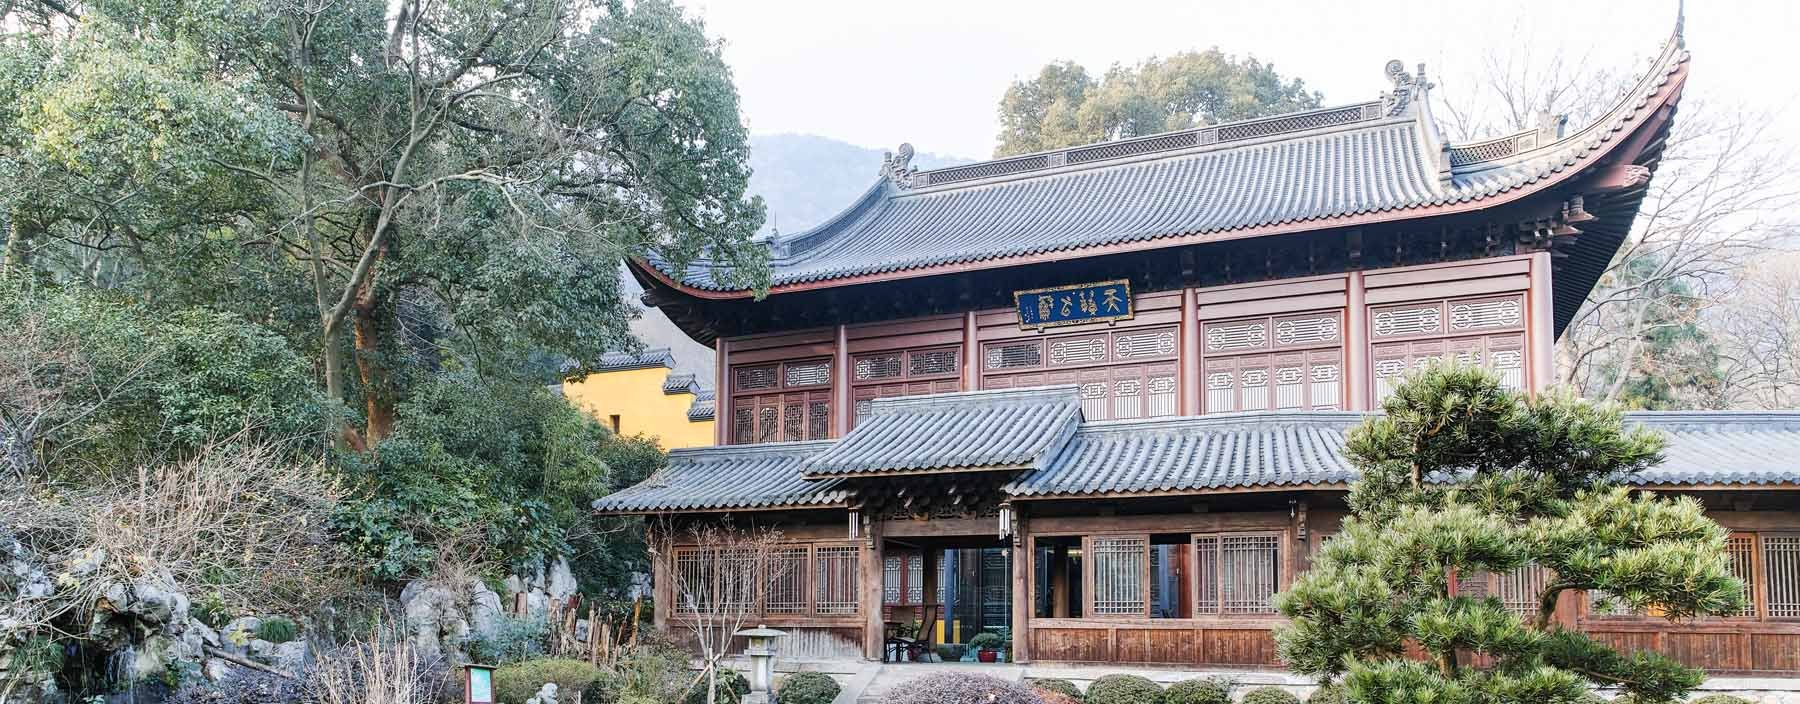 cn, hangzhou, lingyin tempel (4).jpg